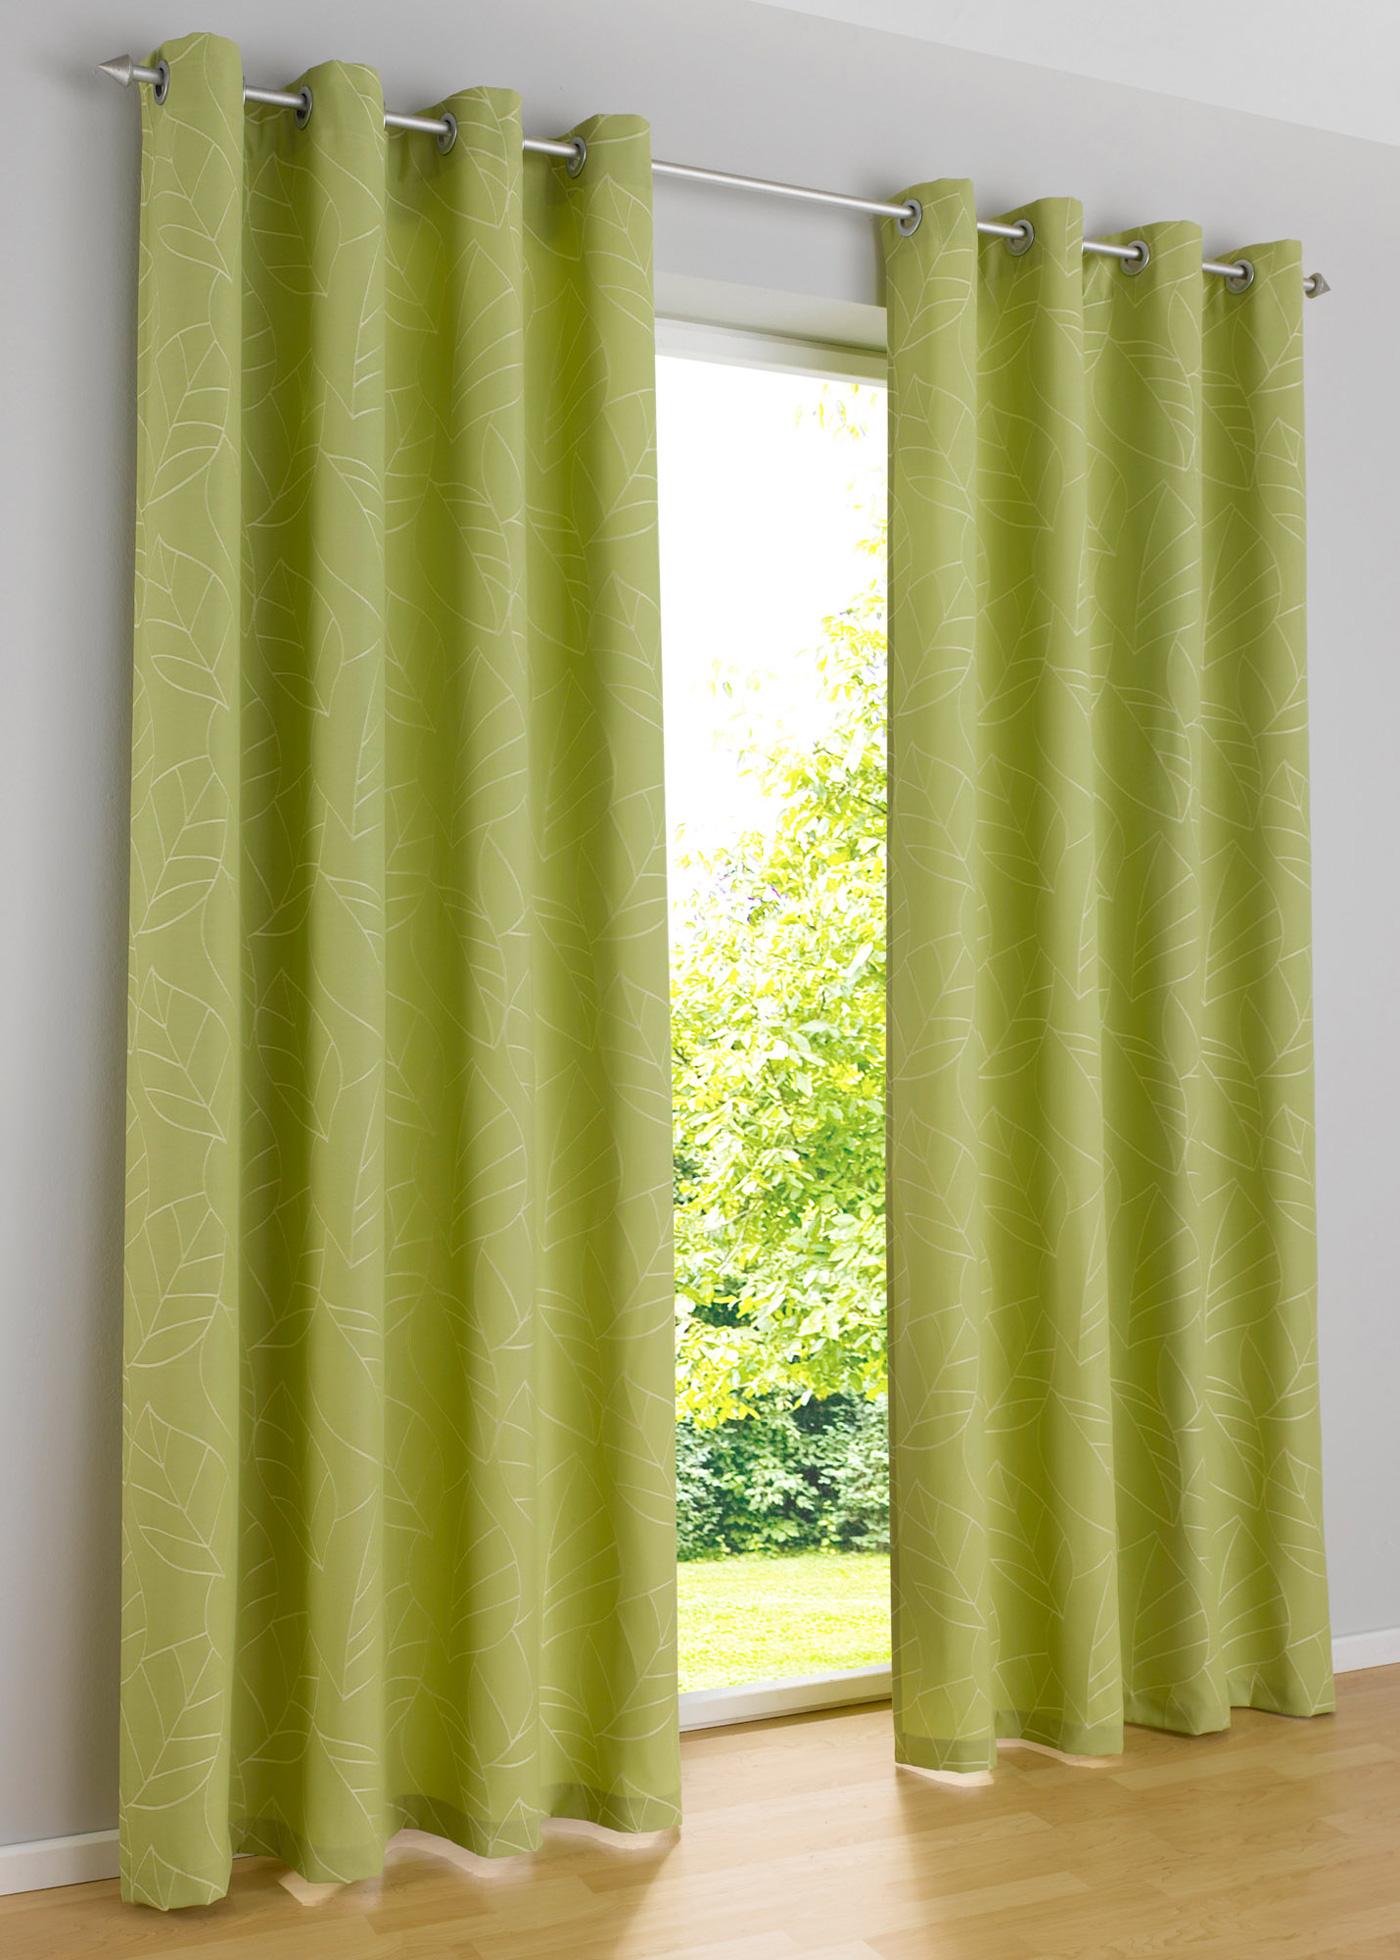 Зеленые шторы на люверсах фото